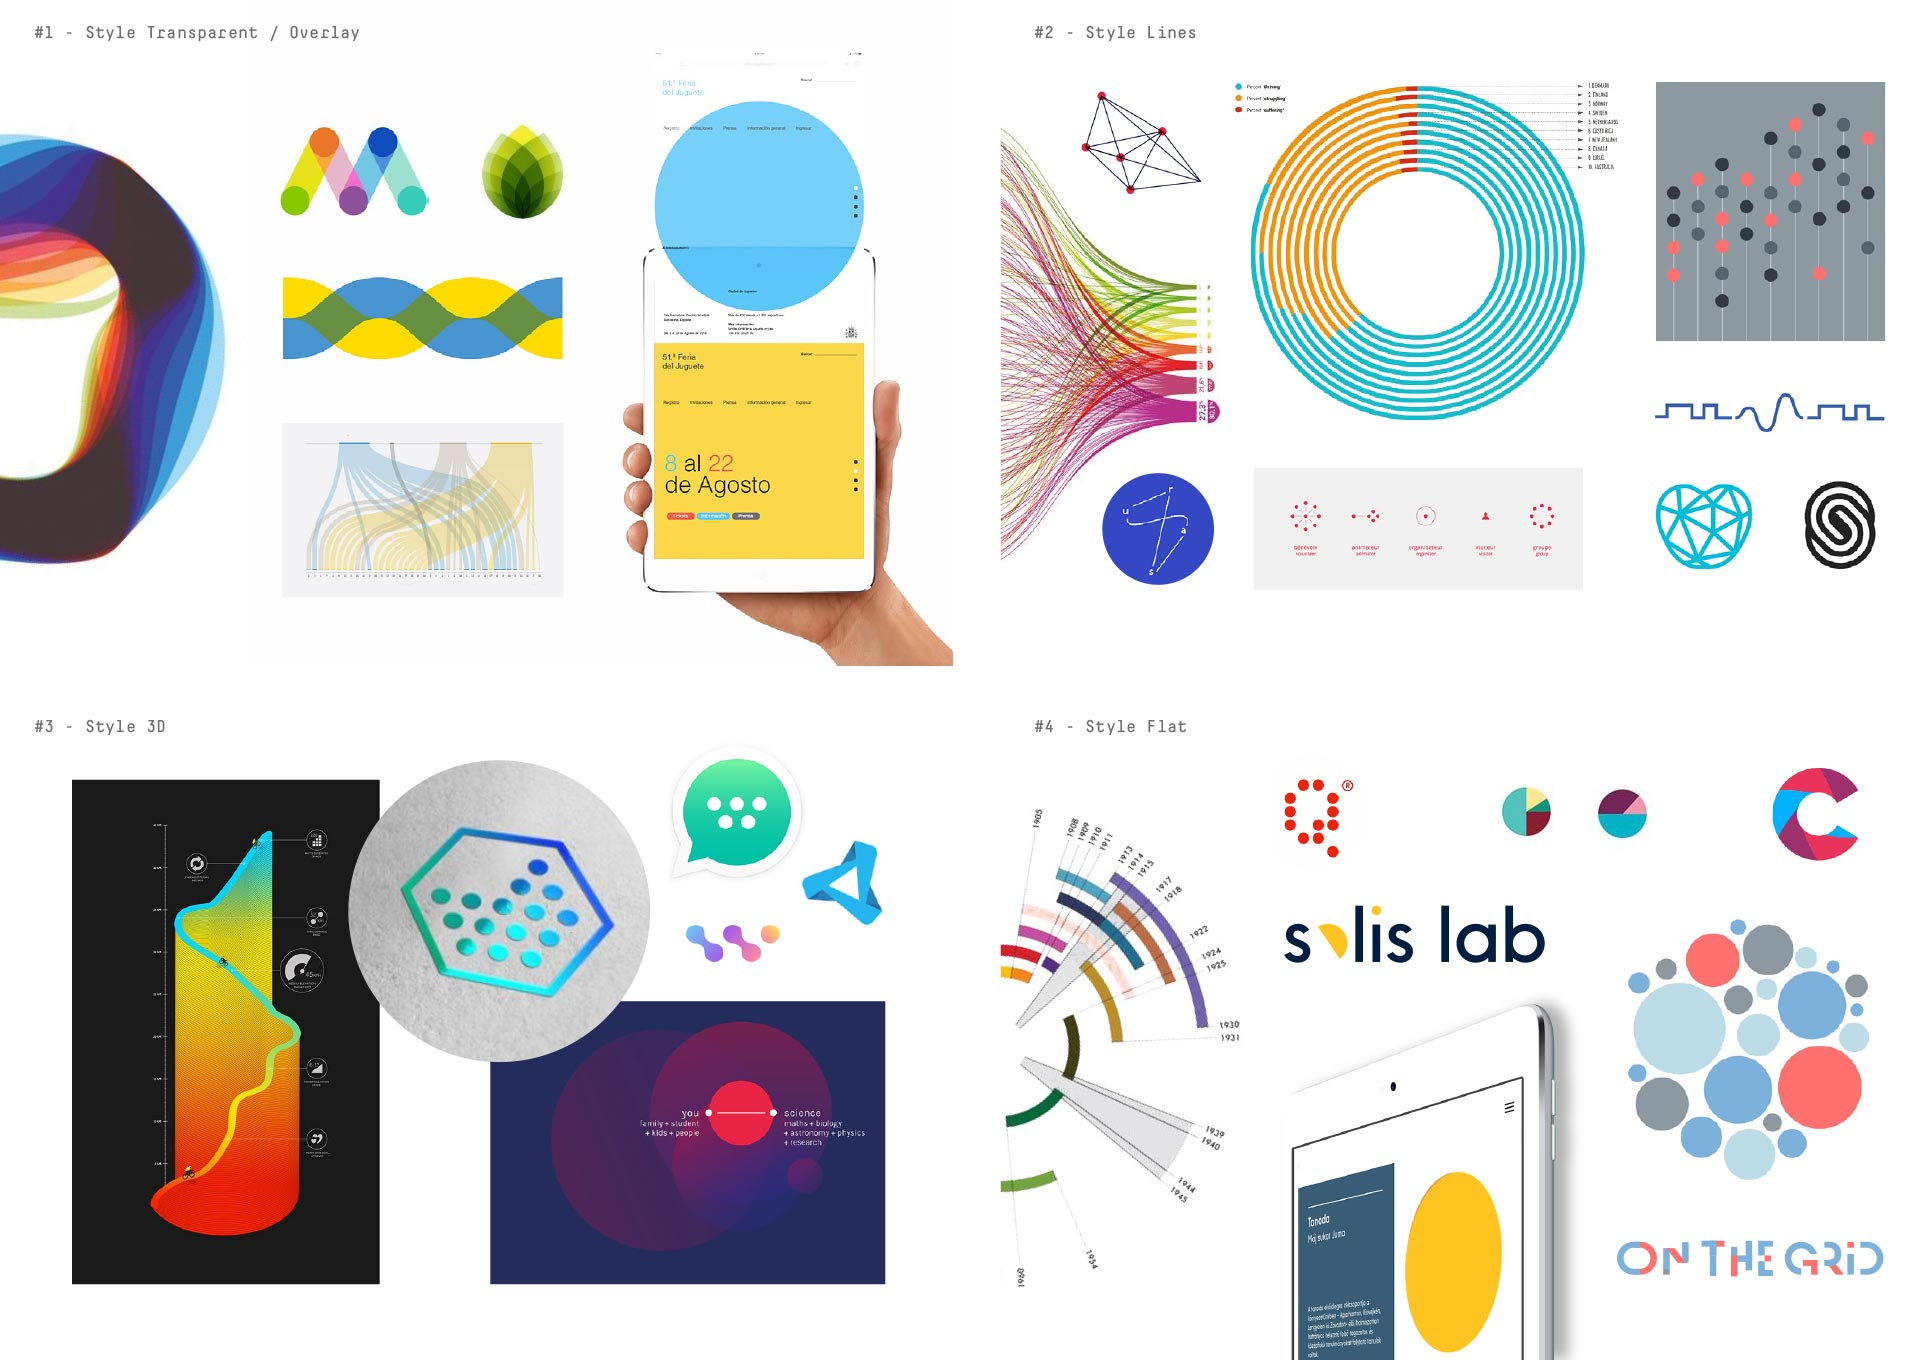 Atilika Tokyo Japan - ai artificial intelligence & language processing - Logo, Corporate Identity Design and Website UI Design